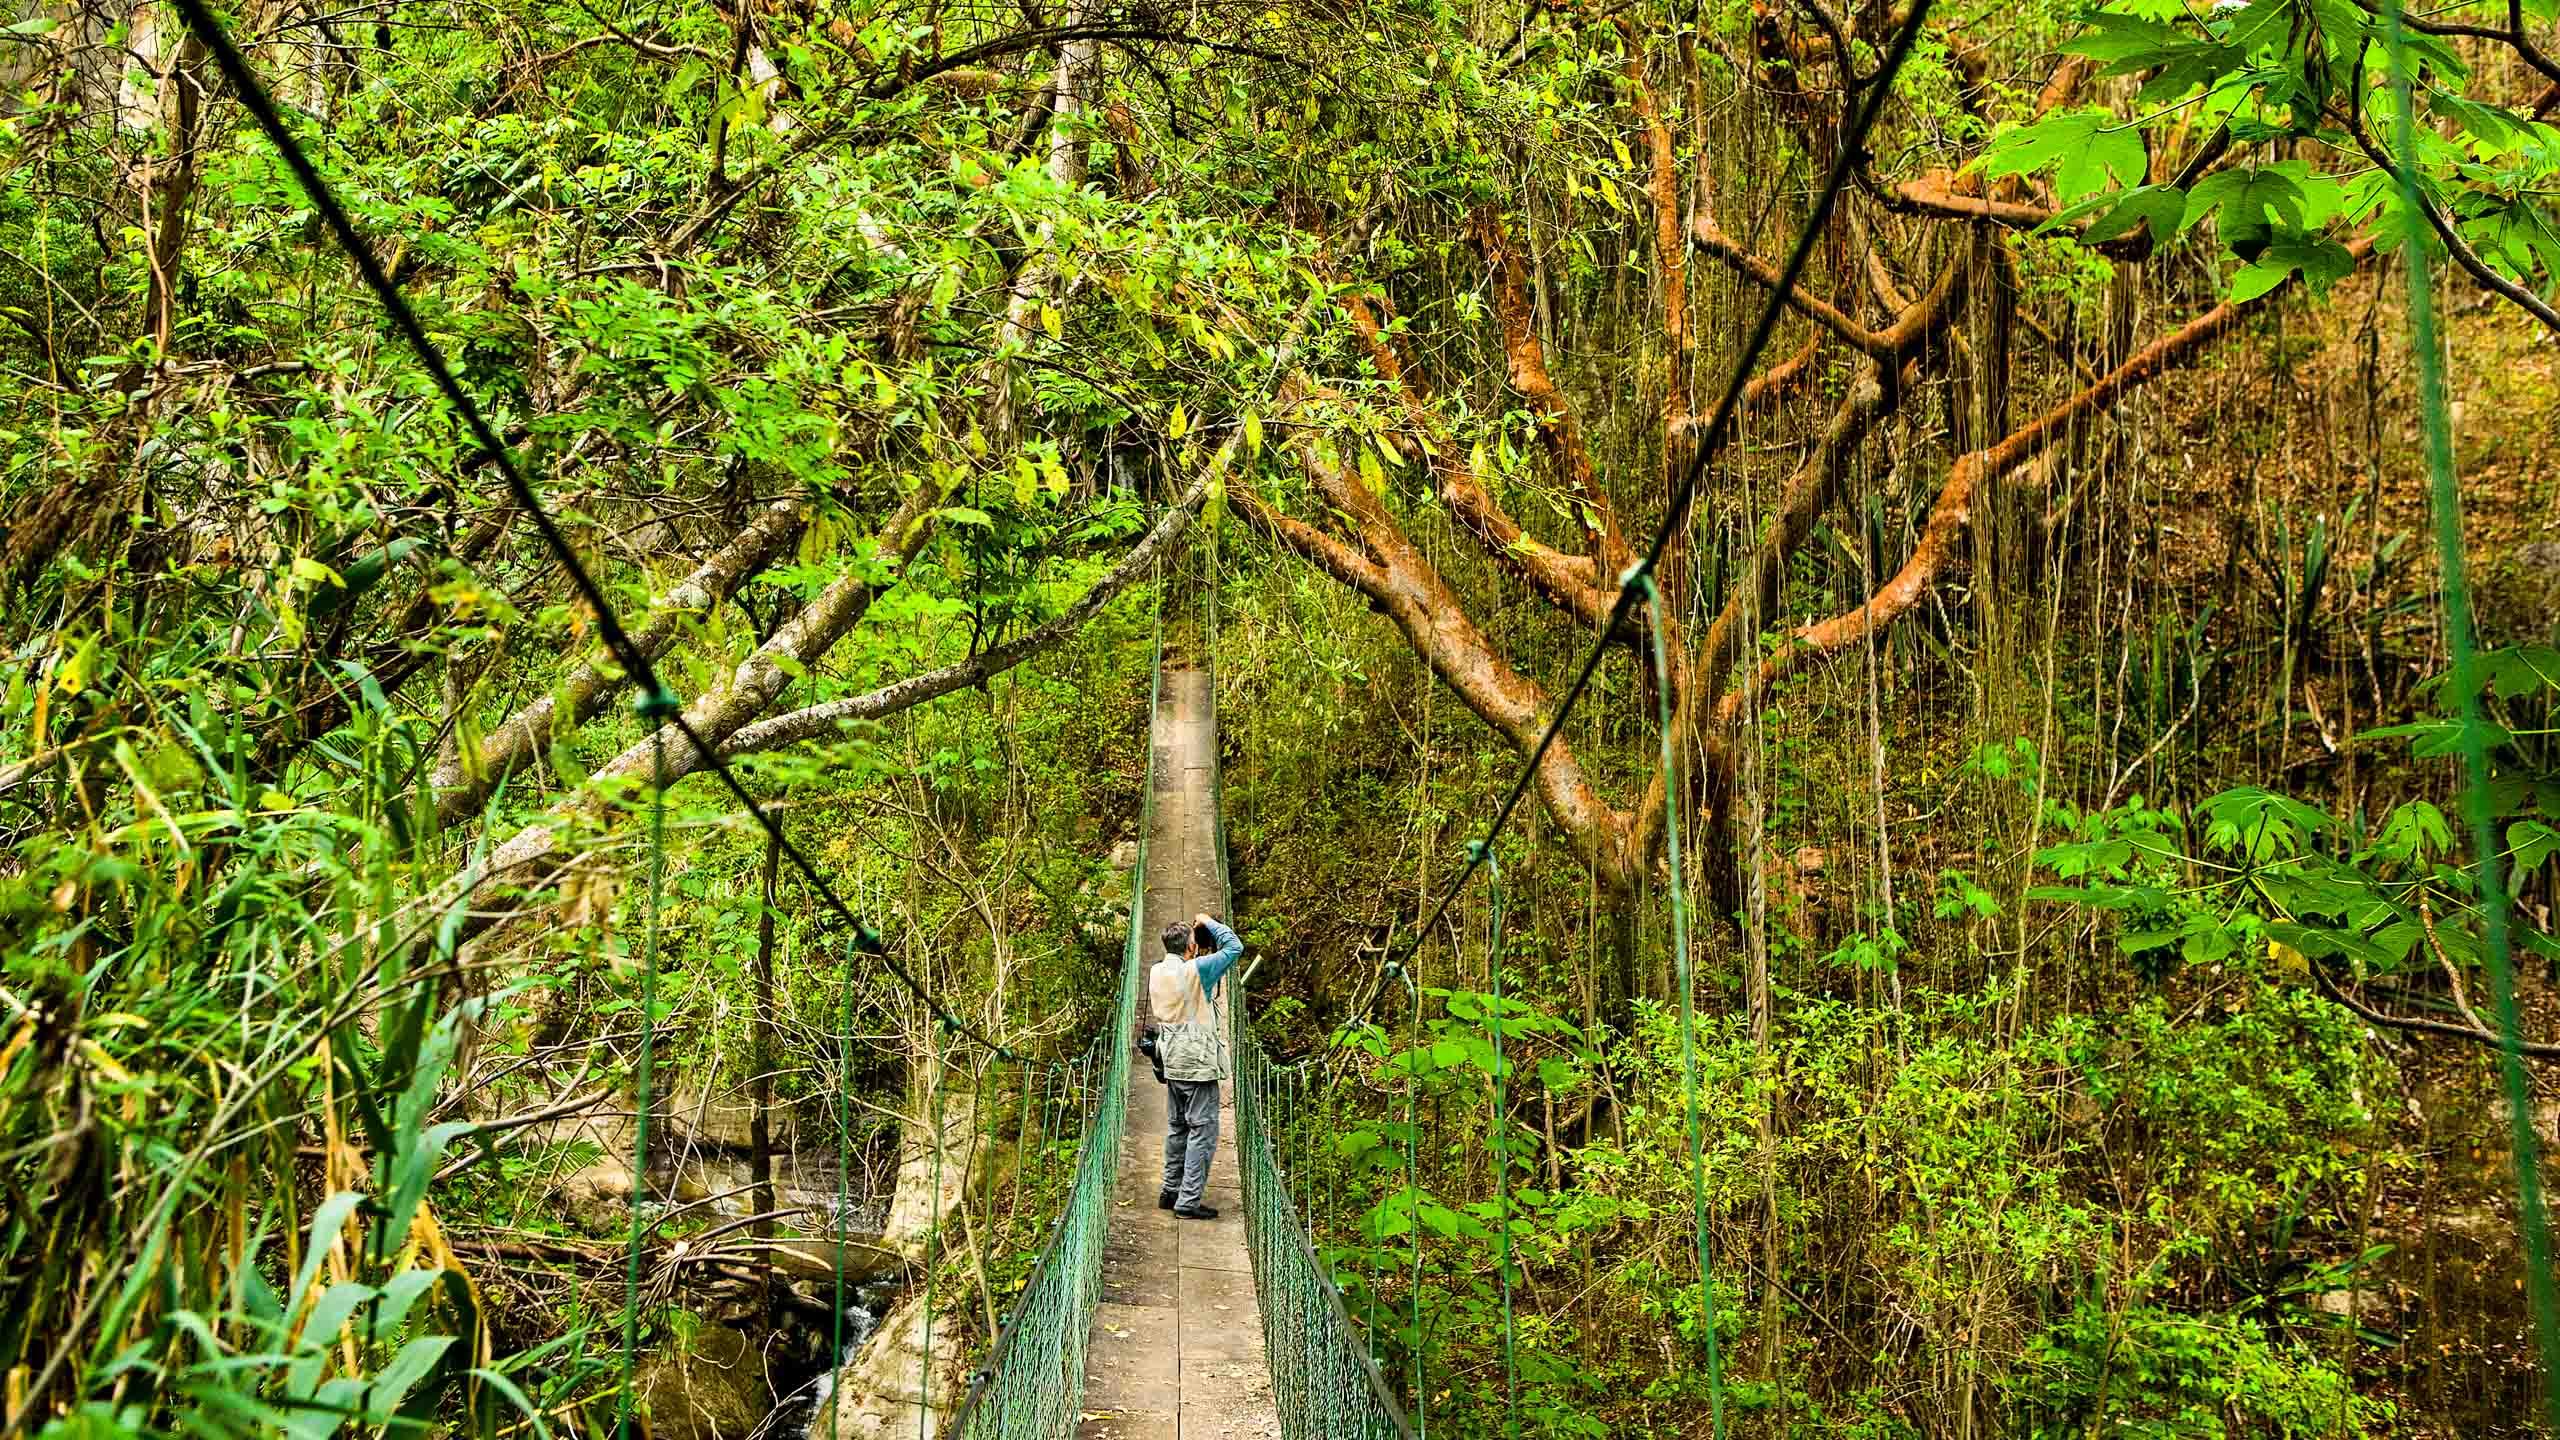 Man stands on bridge in Guatemala rainforest